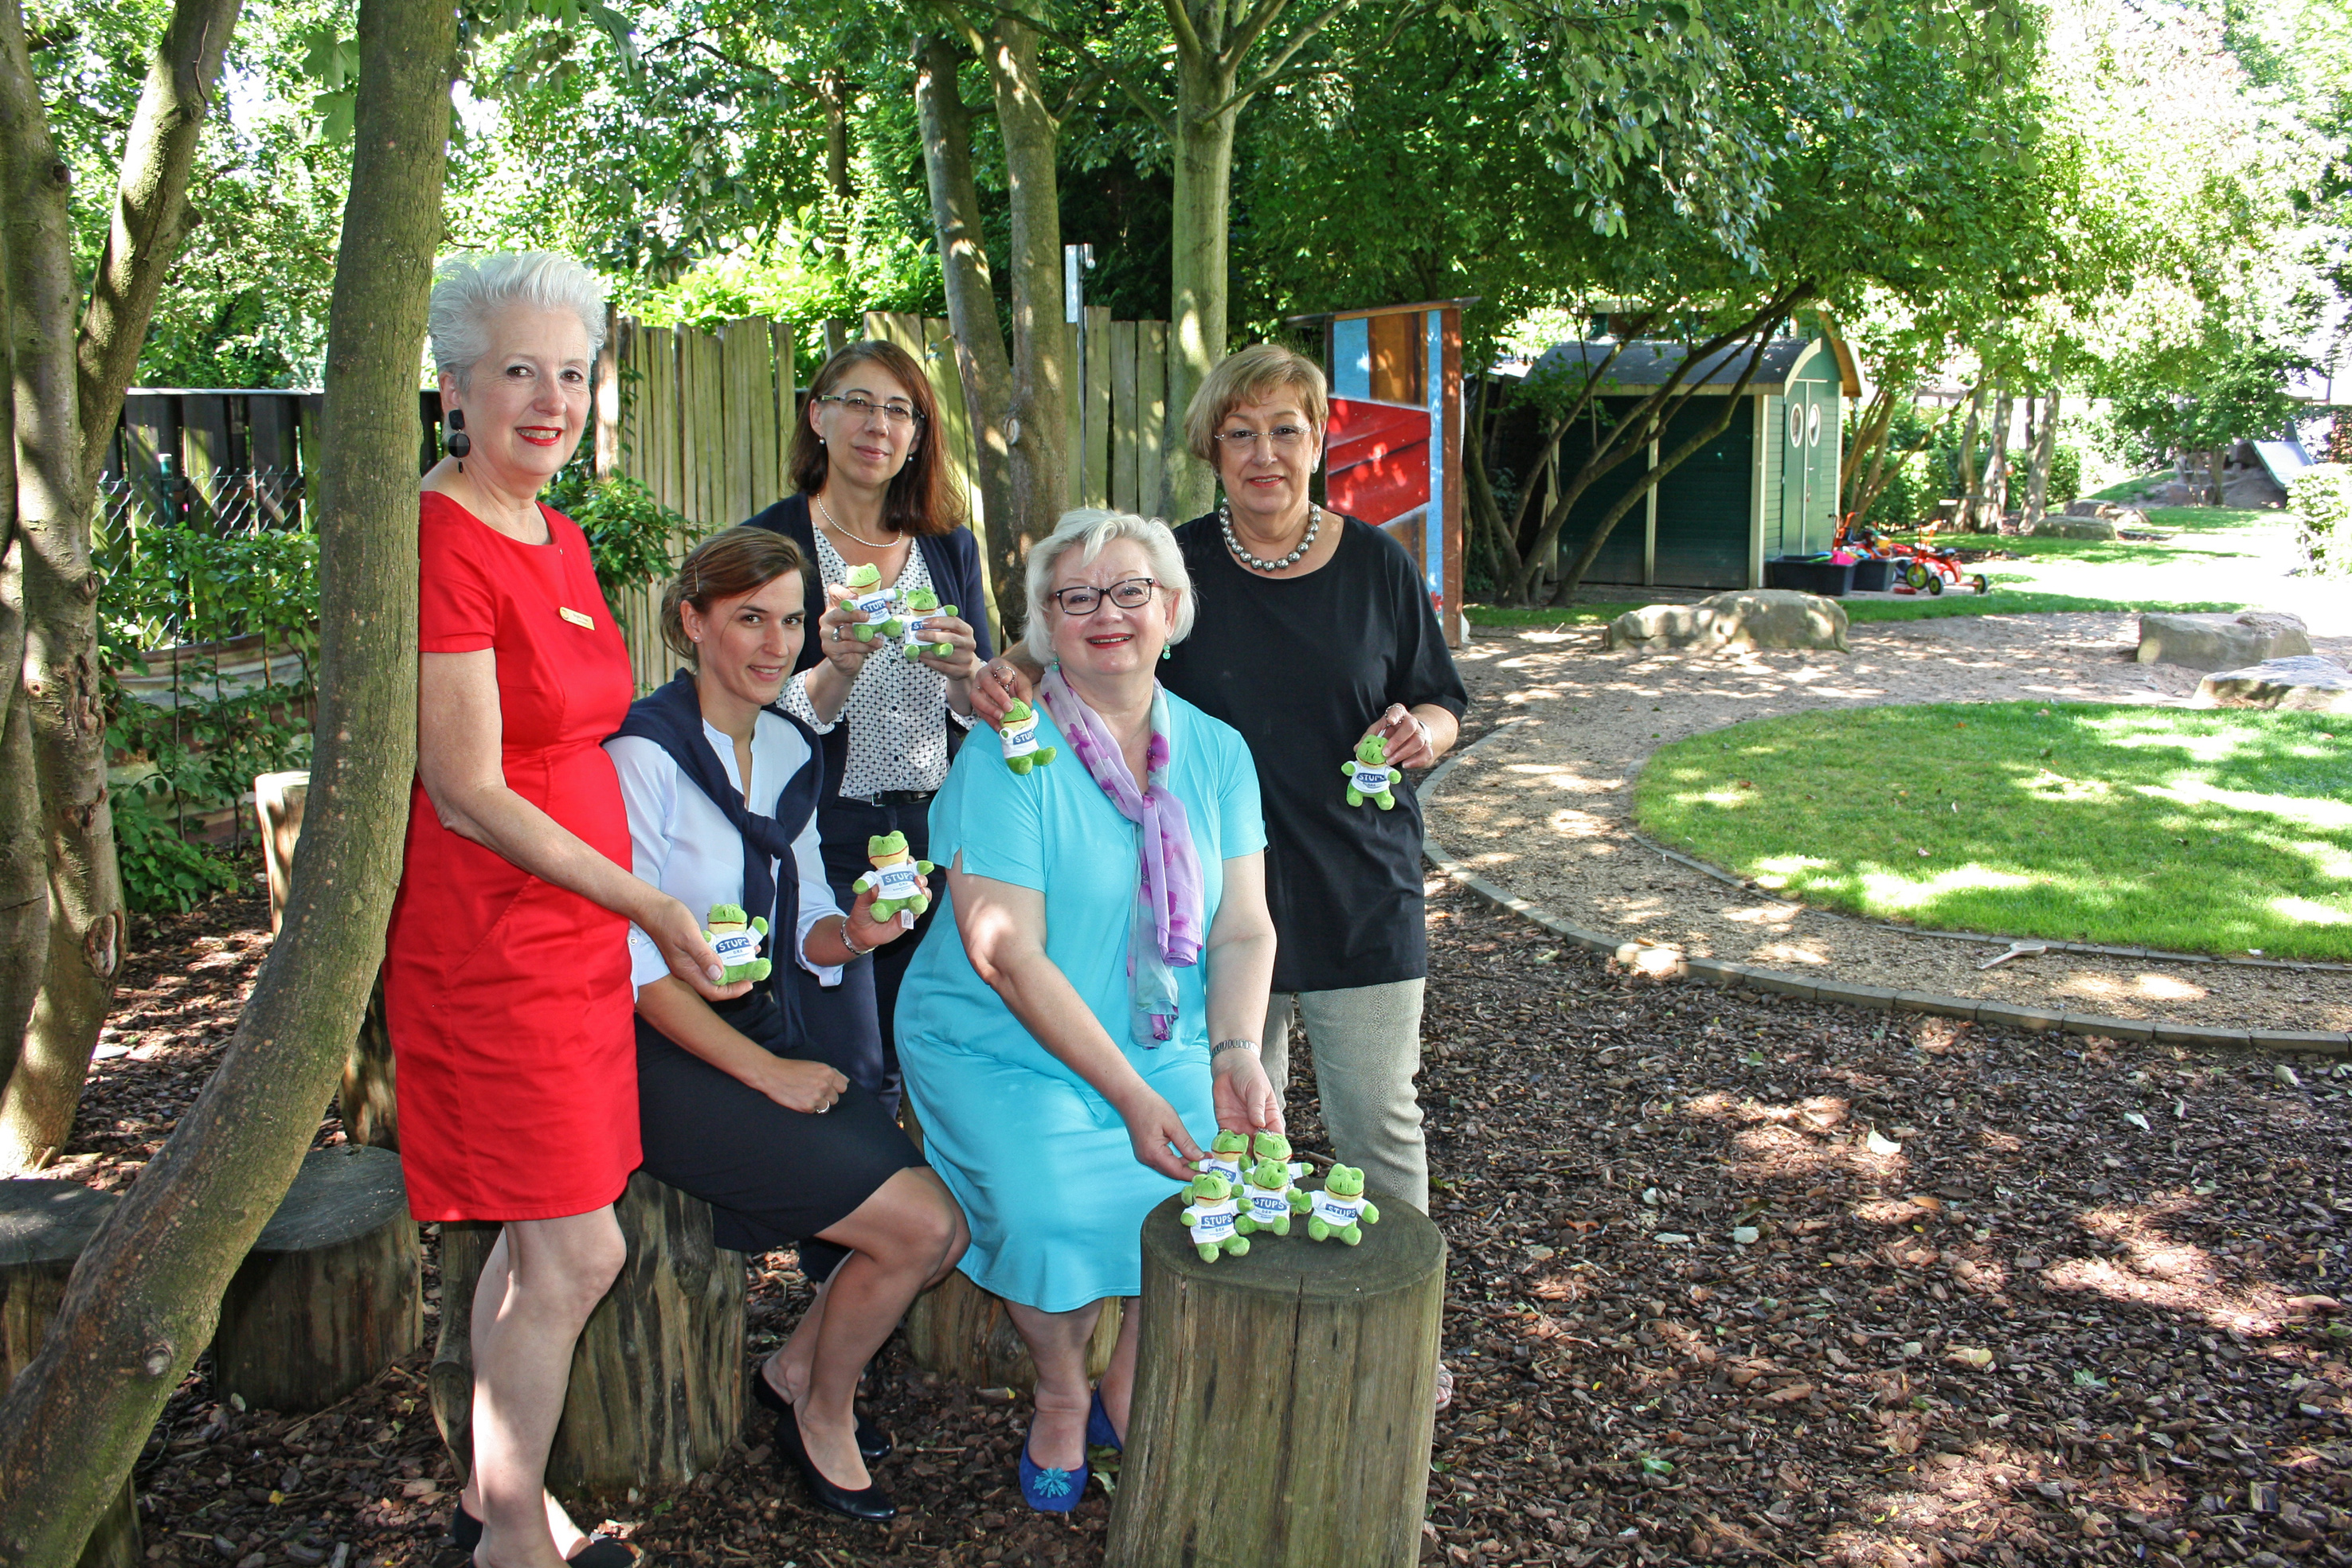 v.l.: Birgitta Trapp, Diane Kamps, Karin Meincke, Club-Kollegin Angelika Linnemann-Dienstbier. (Foto: DRK-Schwesternschaft Krefeld e.V.)